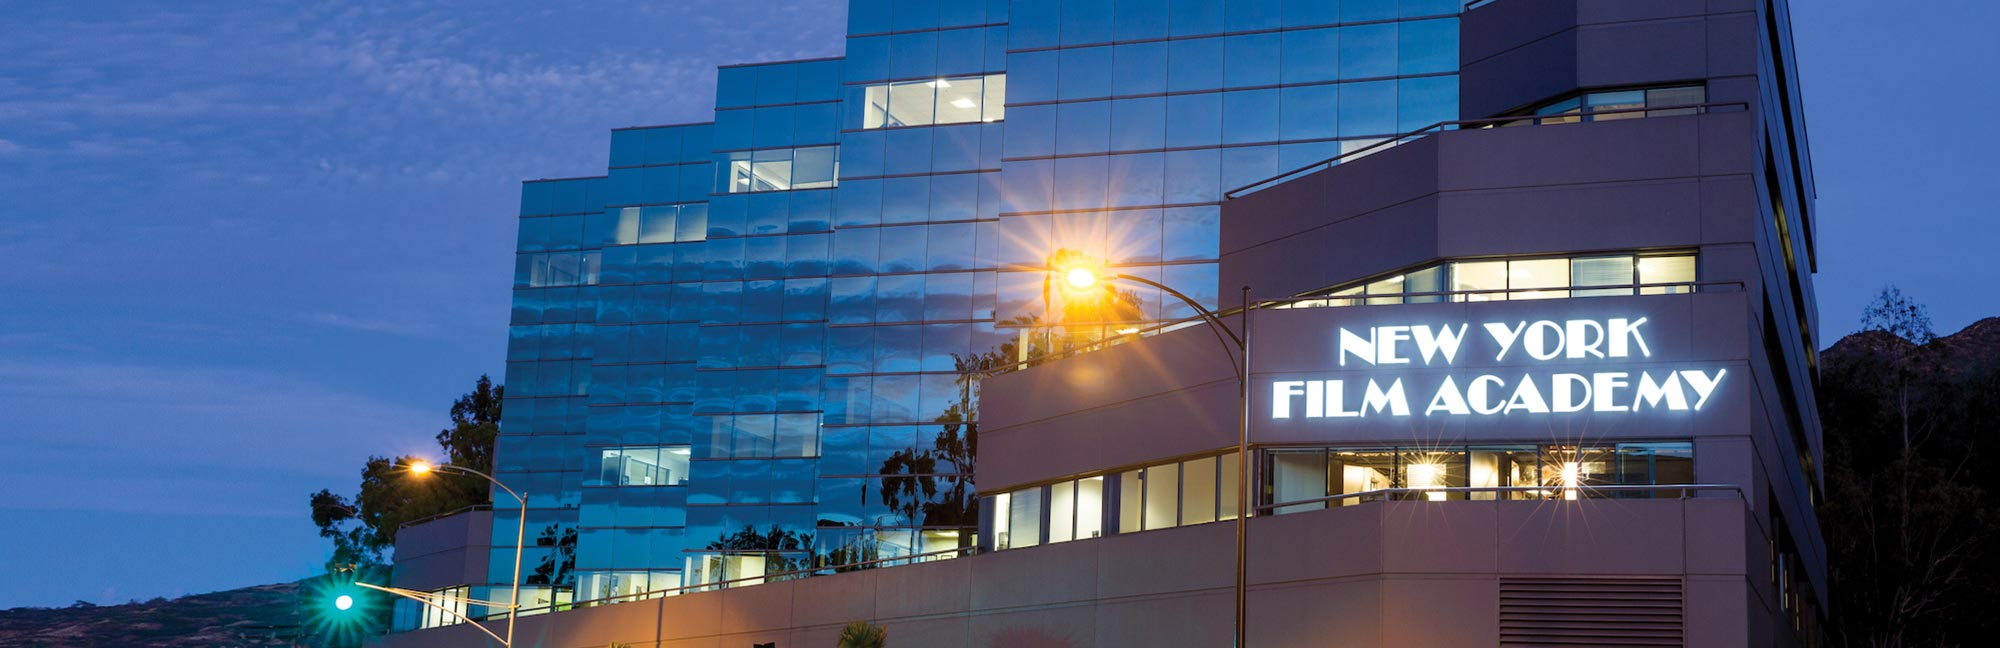 New York Film Academy Los Angeles Niche